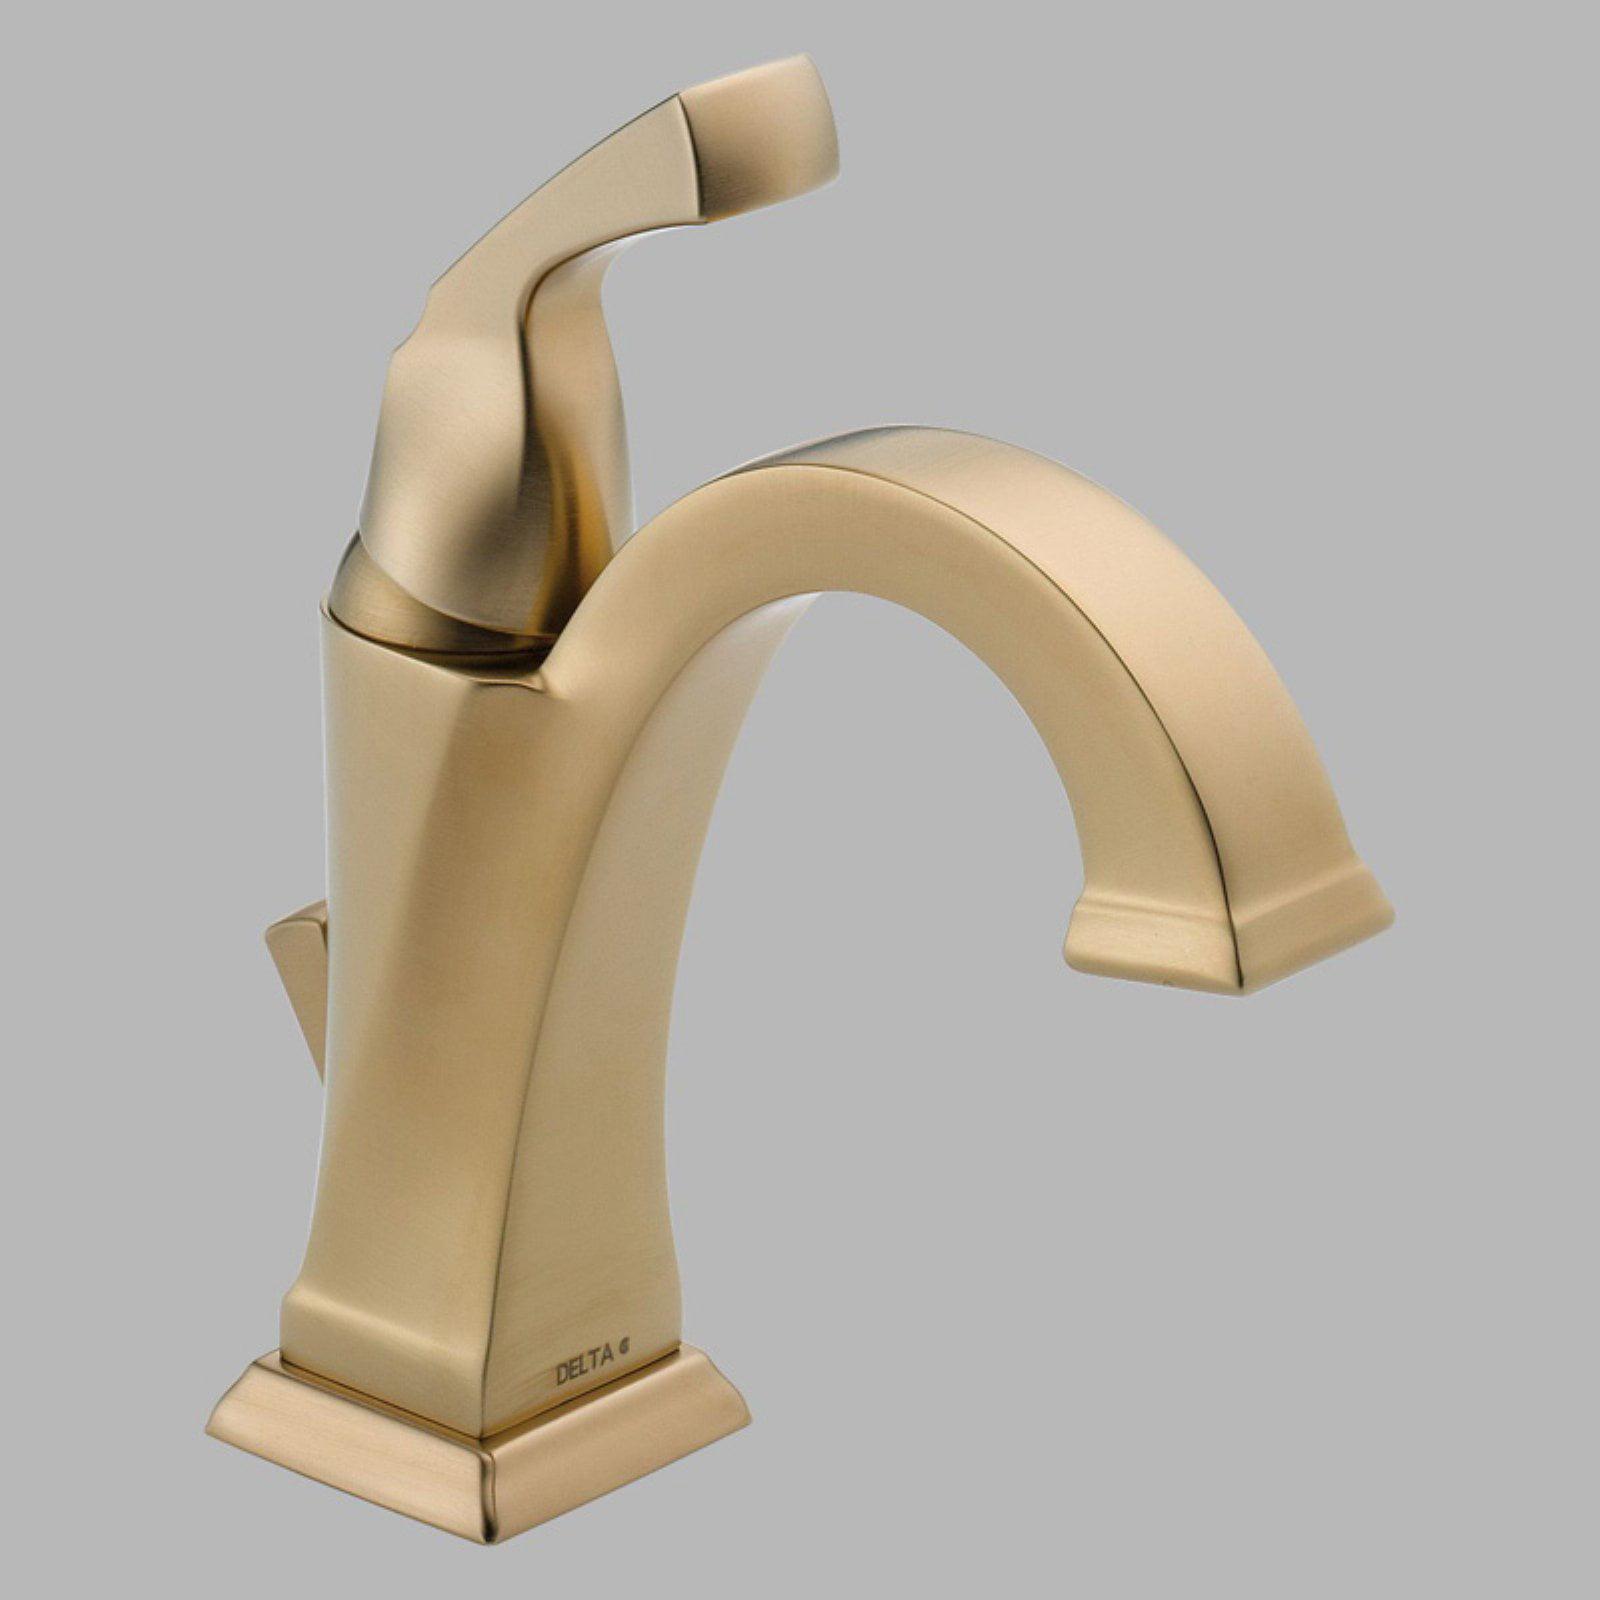 Delta 551-DST Dryden Single Handle Bathroom Faucet w Drain in Chrome